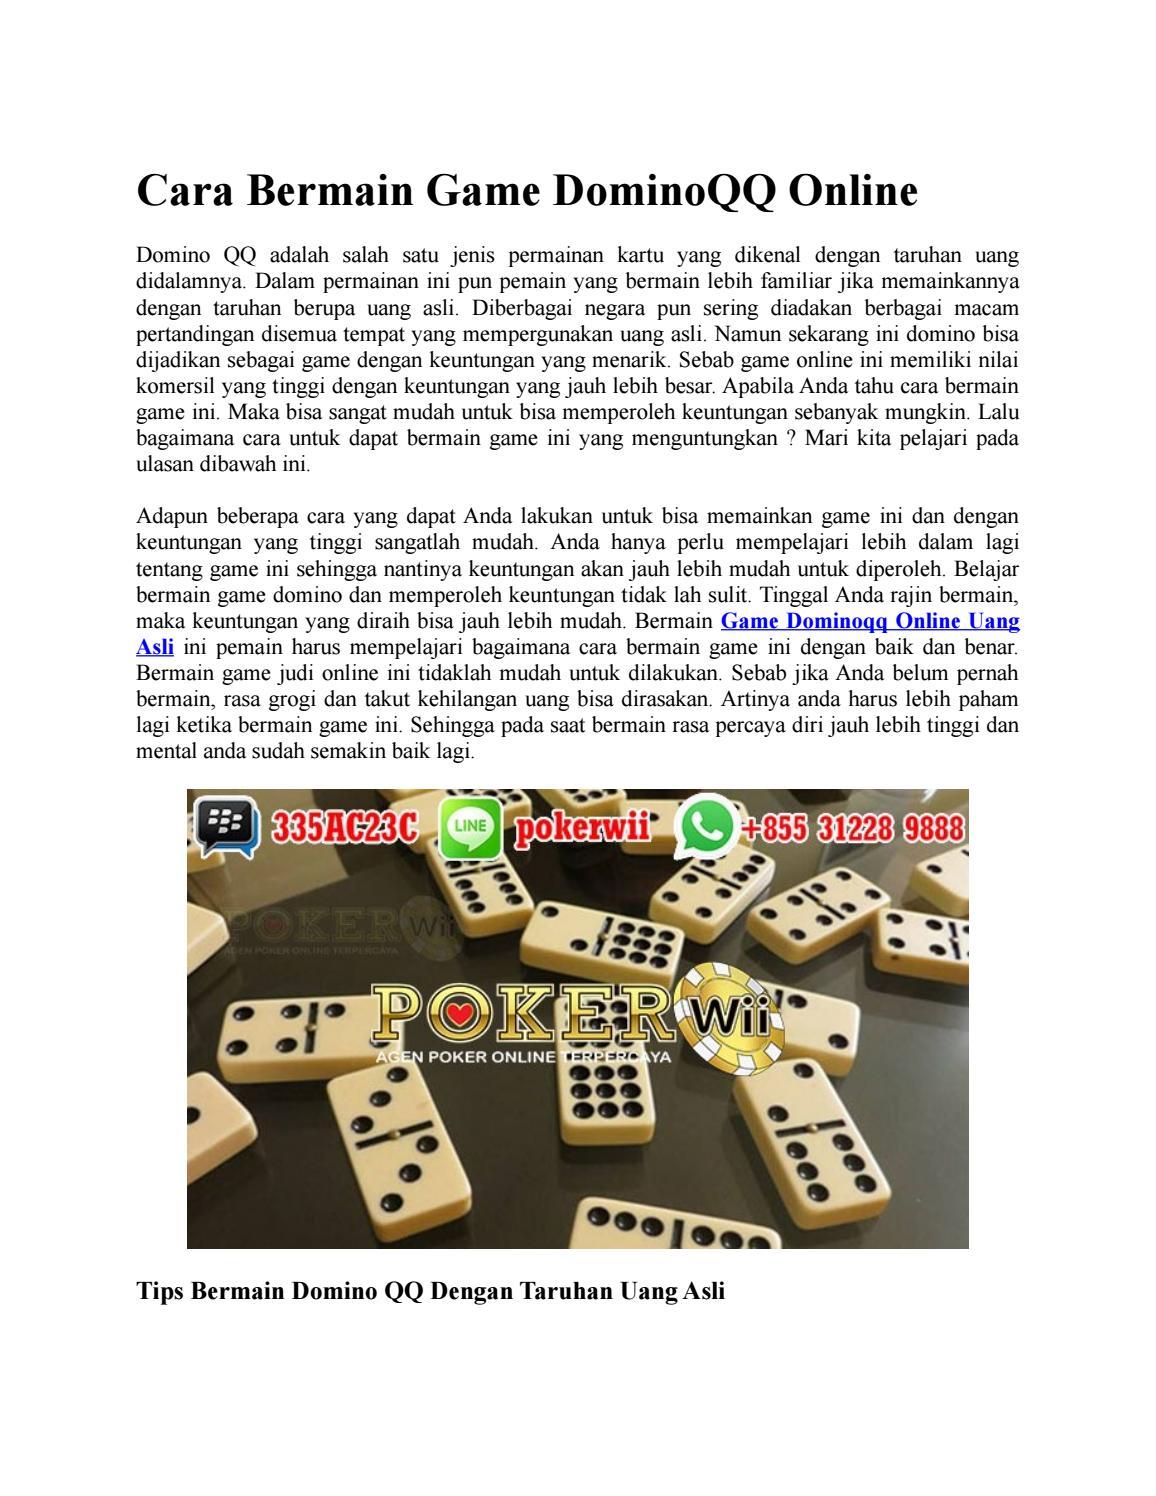 Cara Bermain Game Dominoqq Online By Thalita Oktavia Issuu